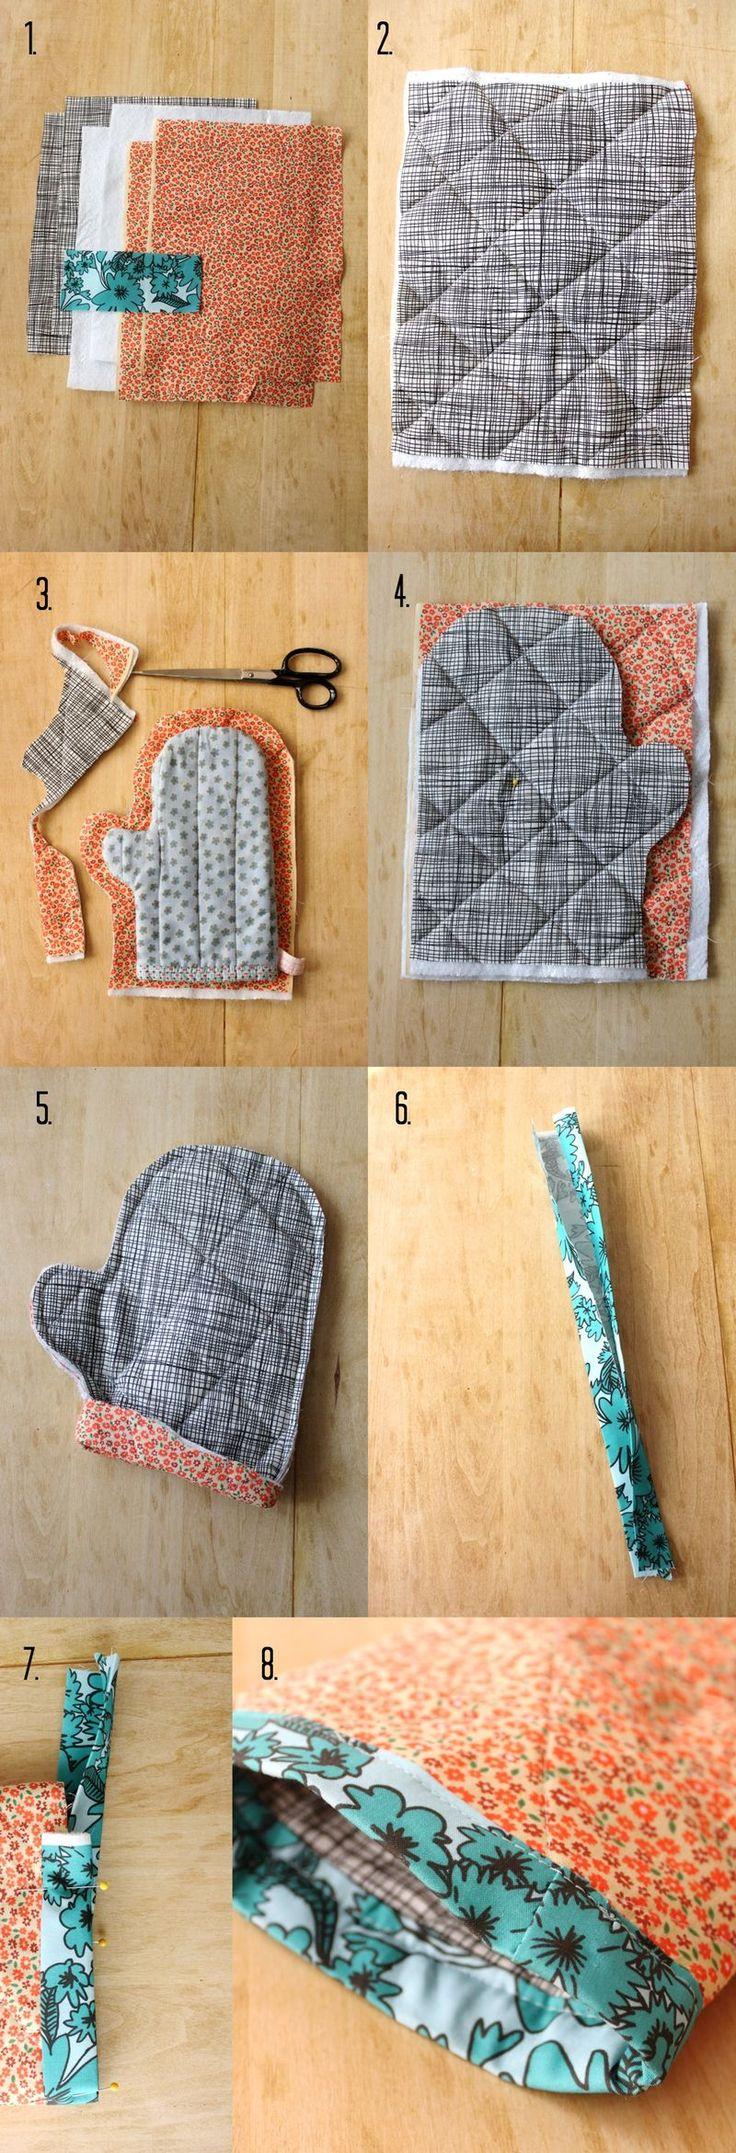 Diy Oven Mit Craft Crafts Easy Idea Ideas Home Sewing Kitchen